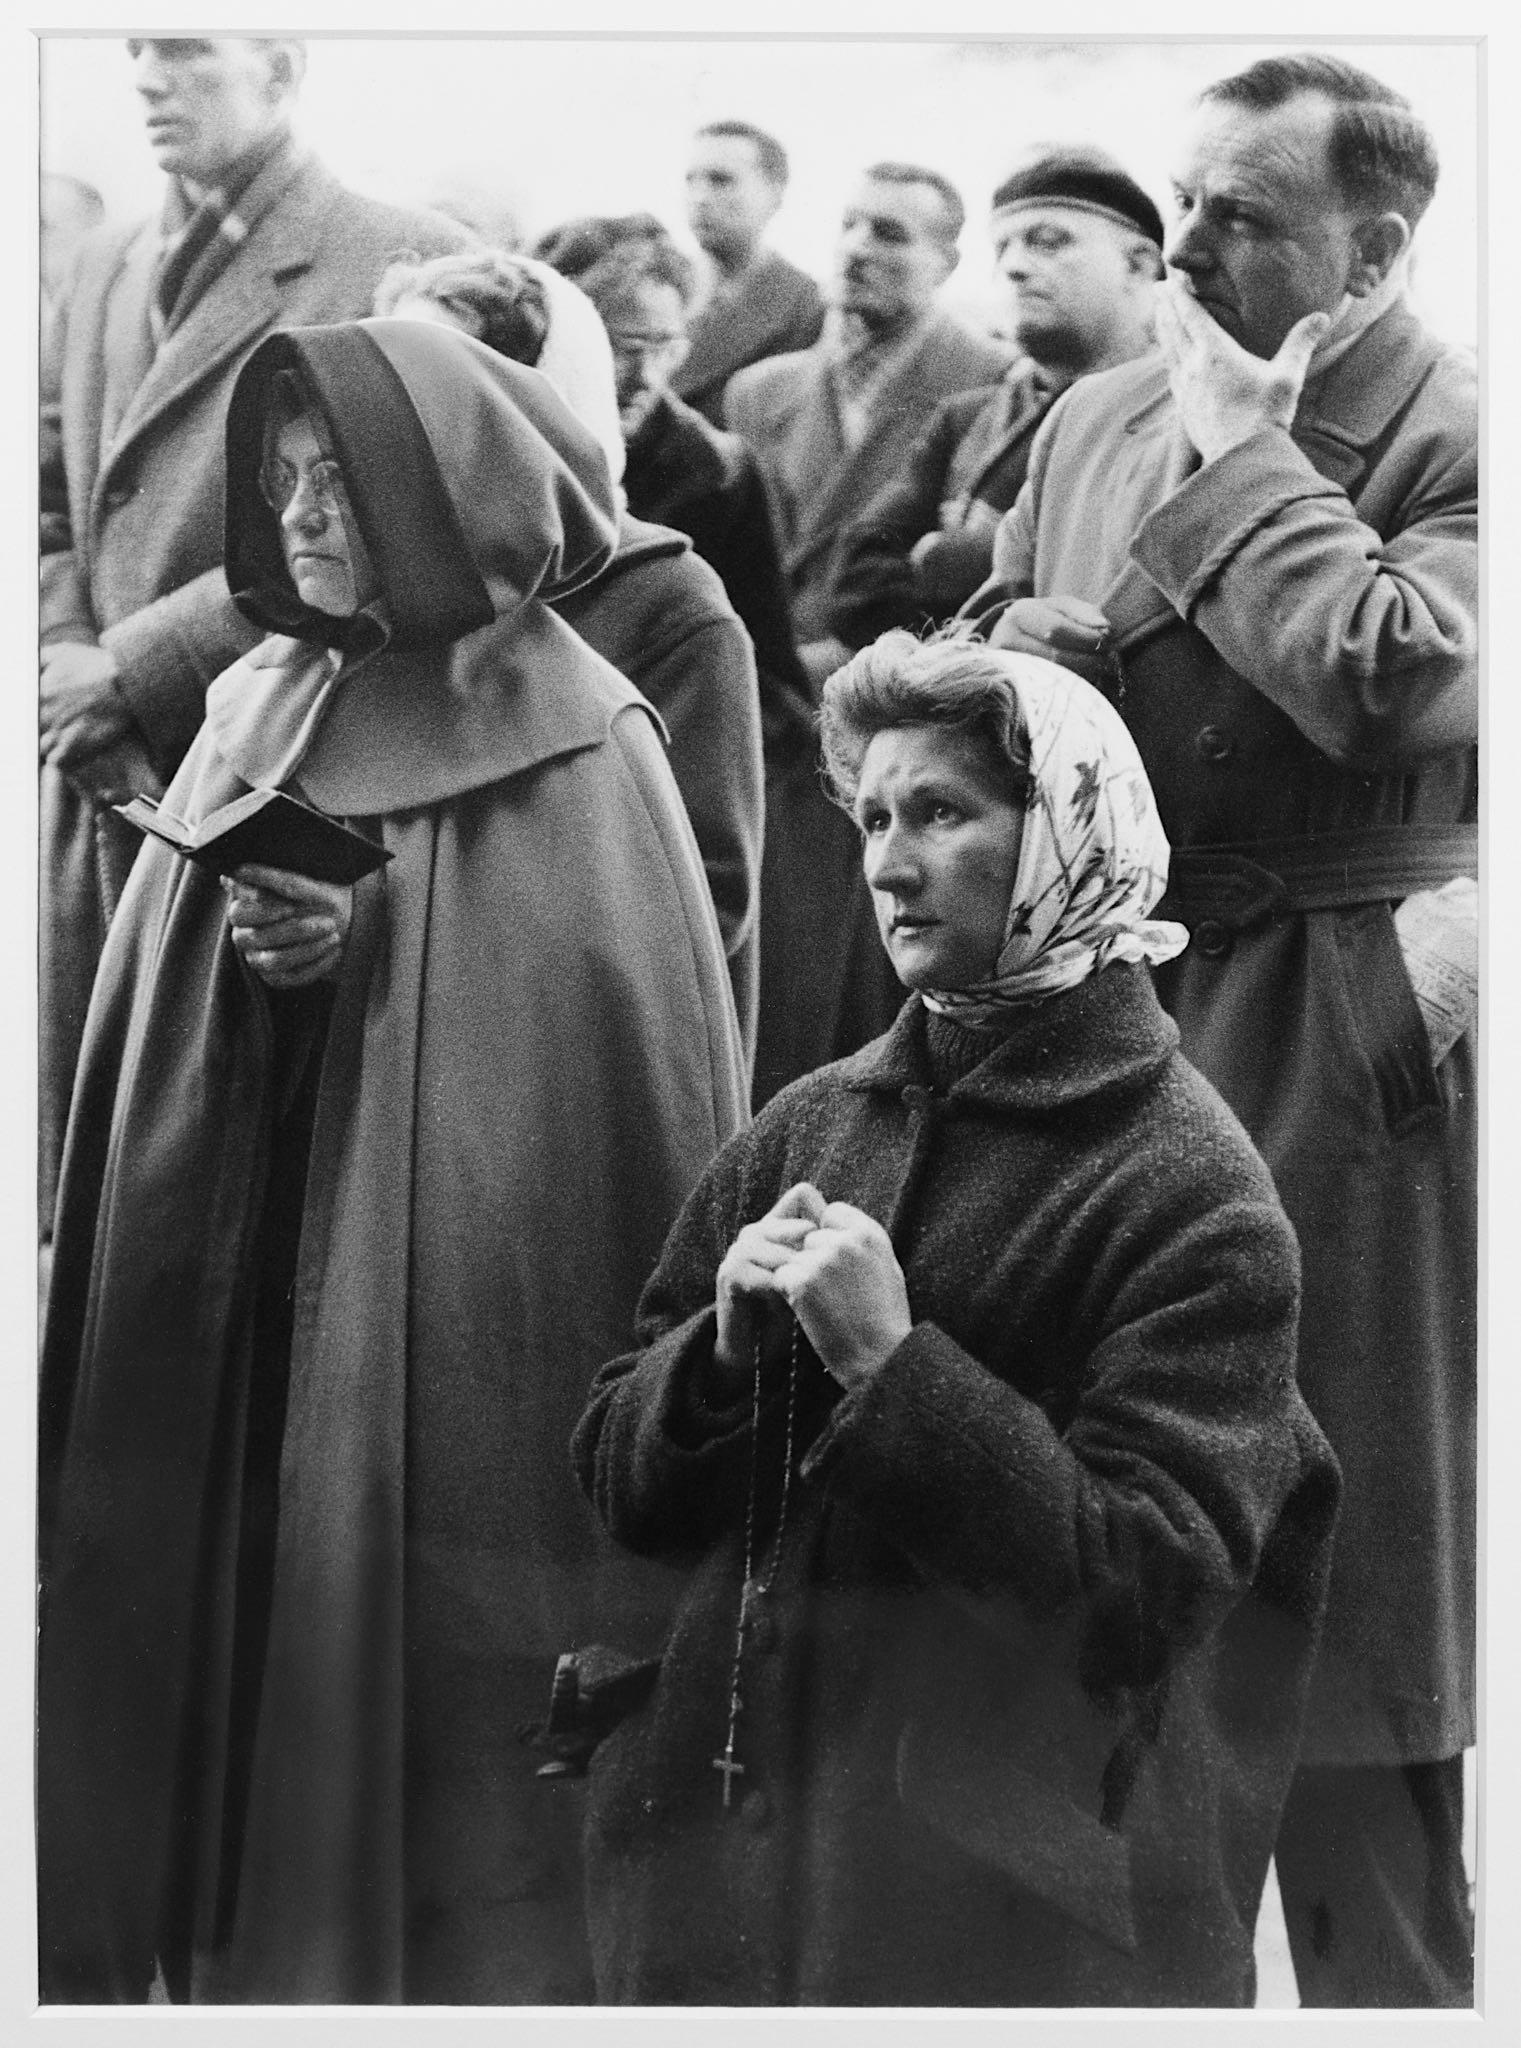 Lot 135 - Cartier-Bresson (Henri) 'Loudres – Pilgrims Assemb